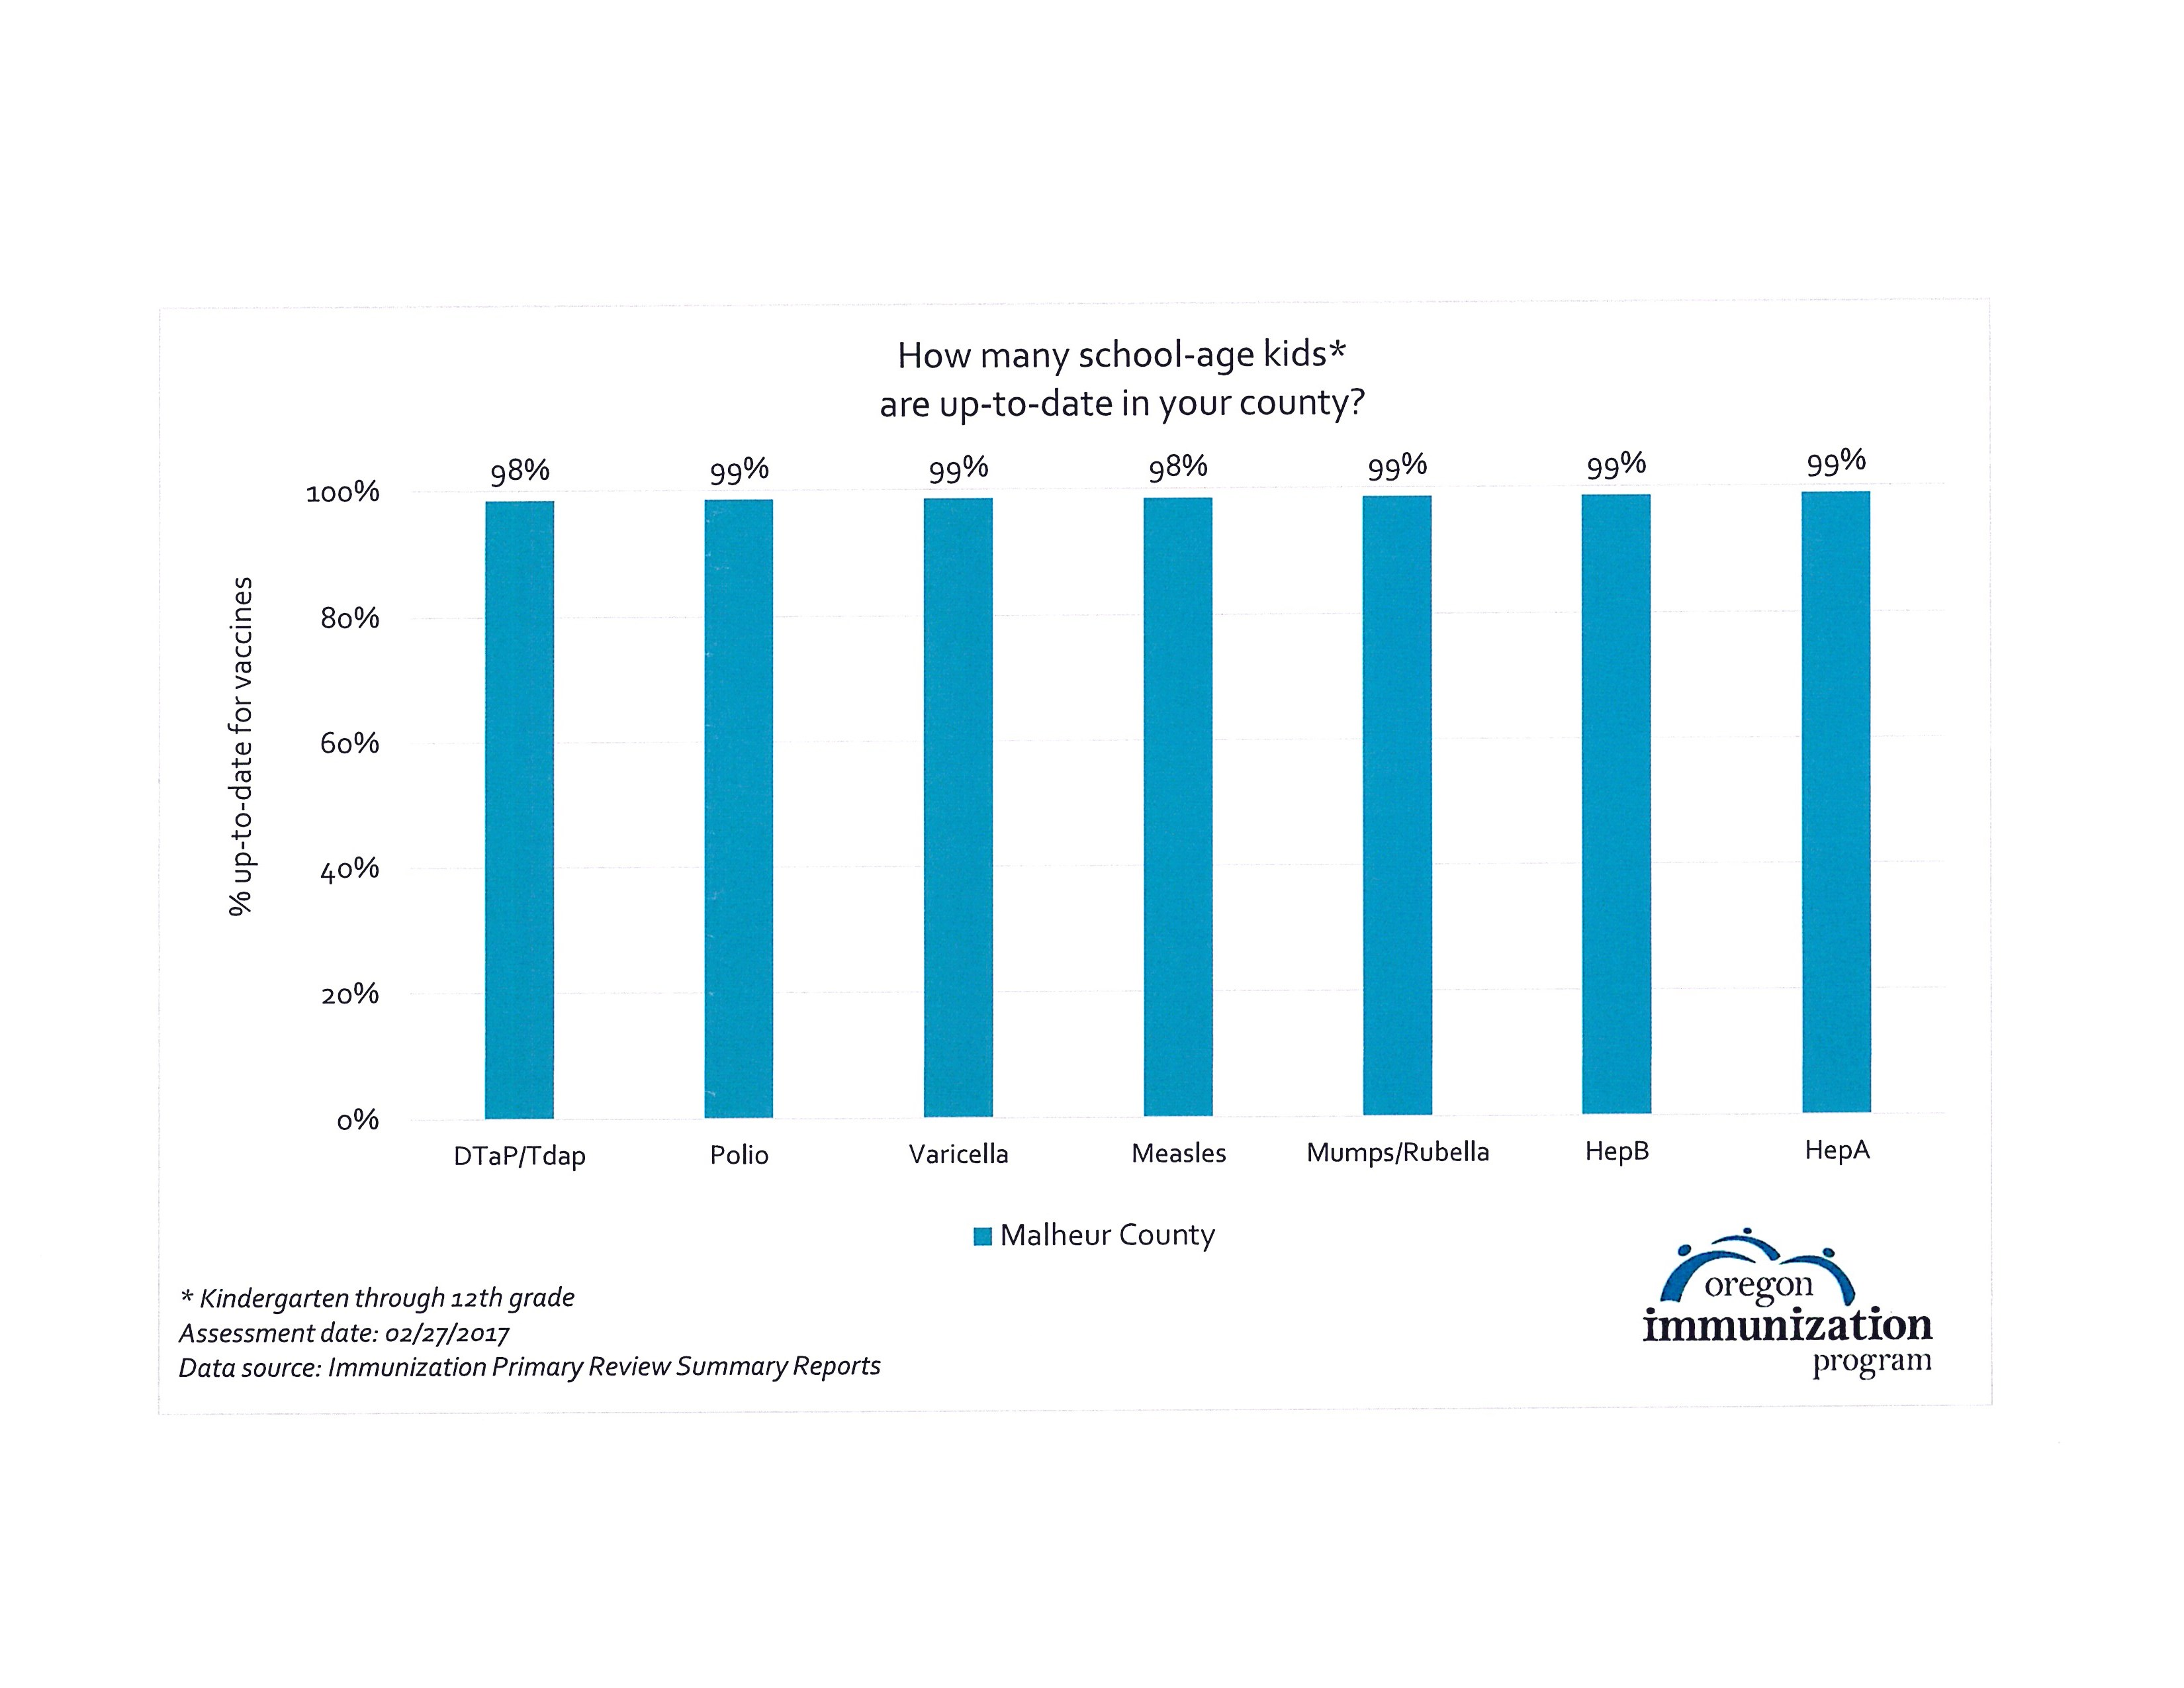 Kinder - 12th grade Immunization rates